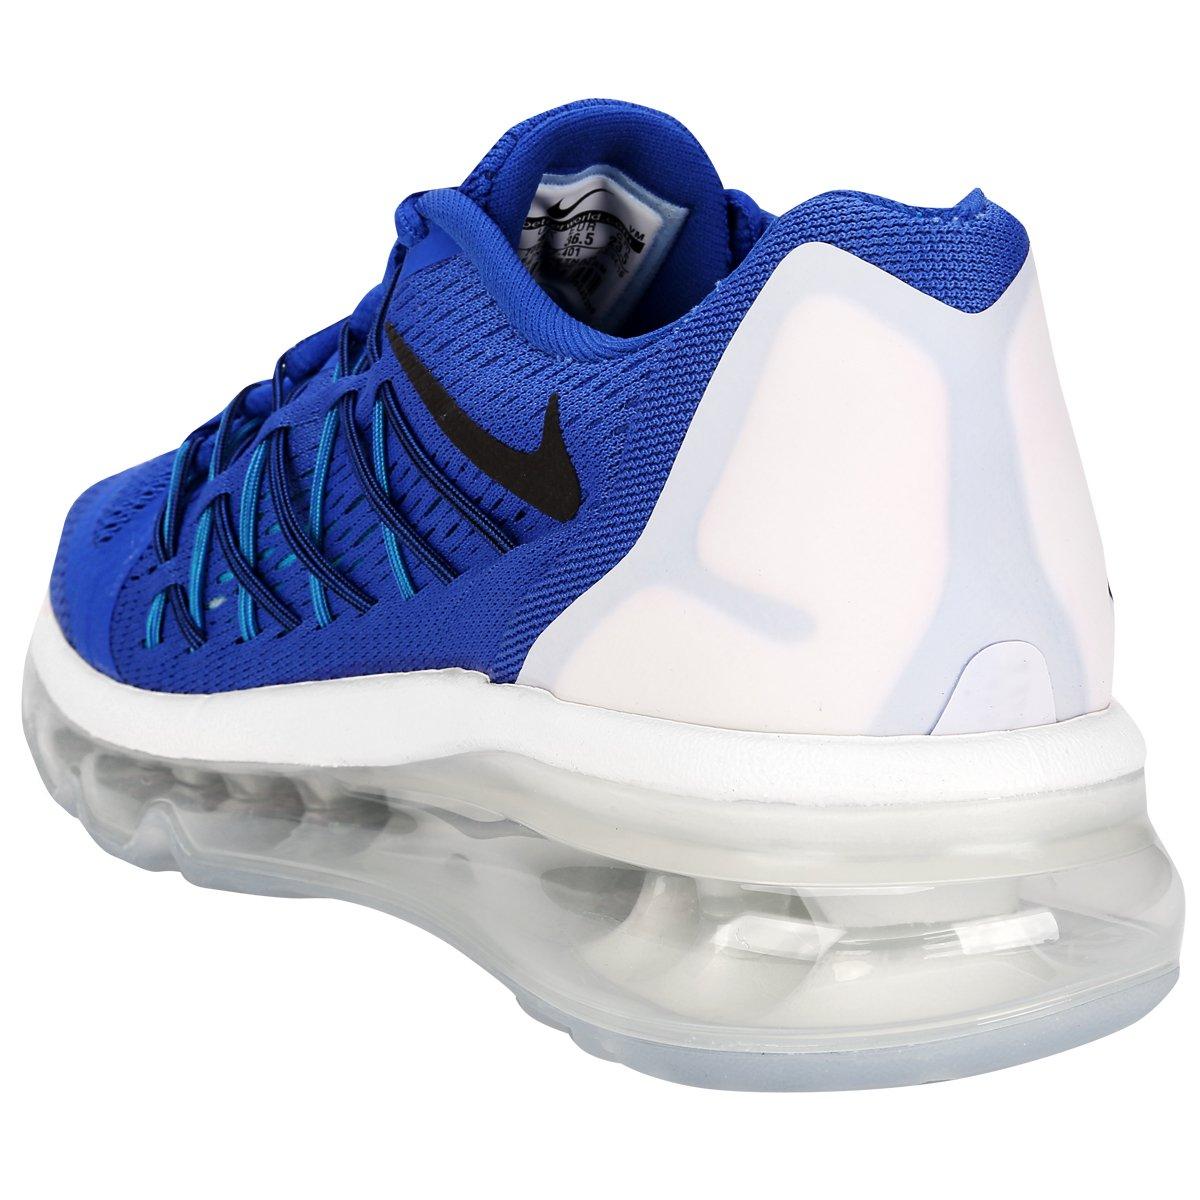 b90412cd8af ... Tênis Nike Air Max 2015 Juvenil - Azul e Branco . ...